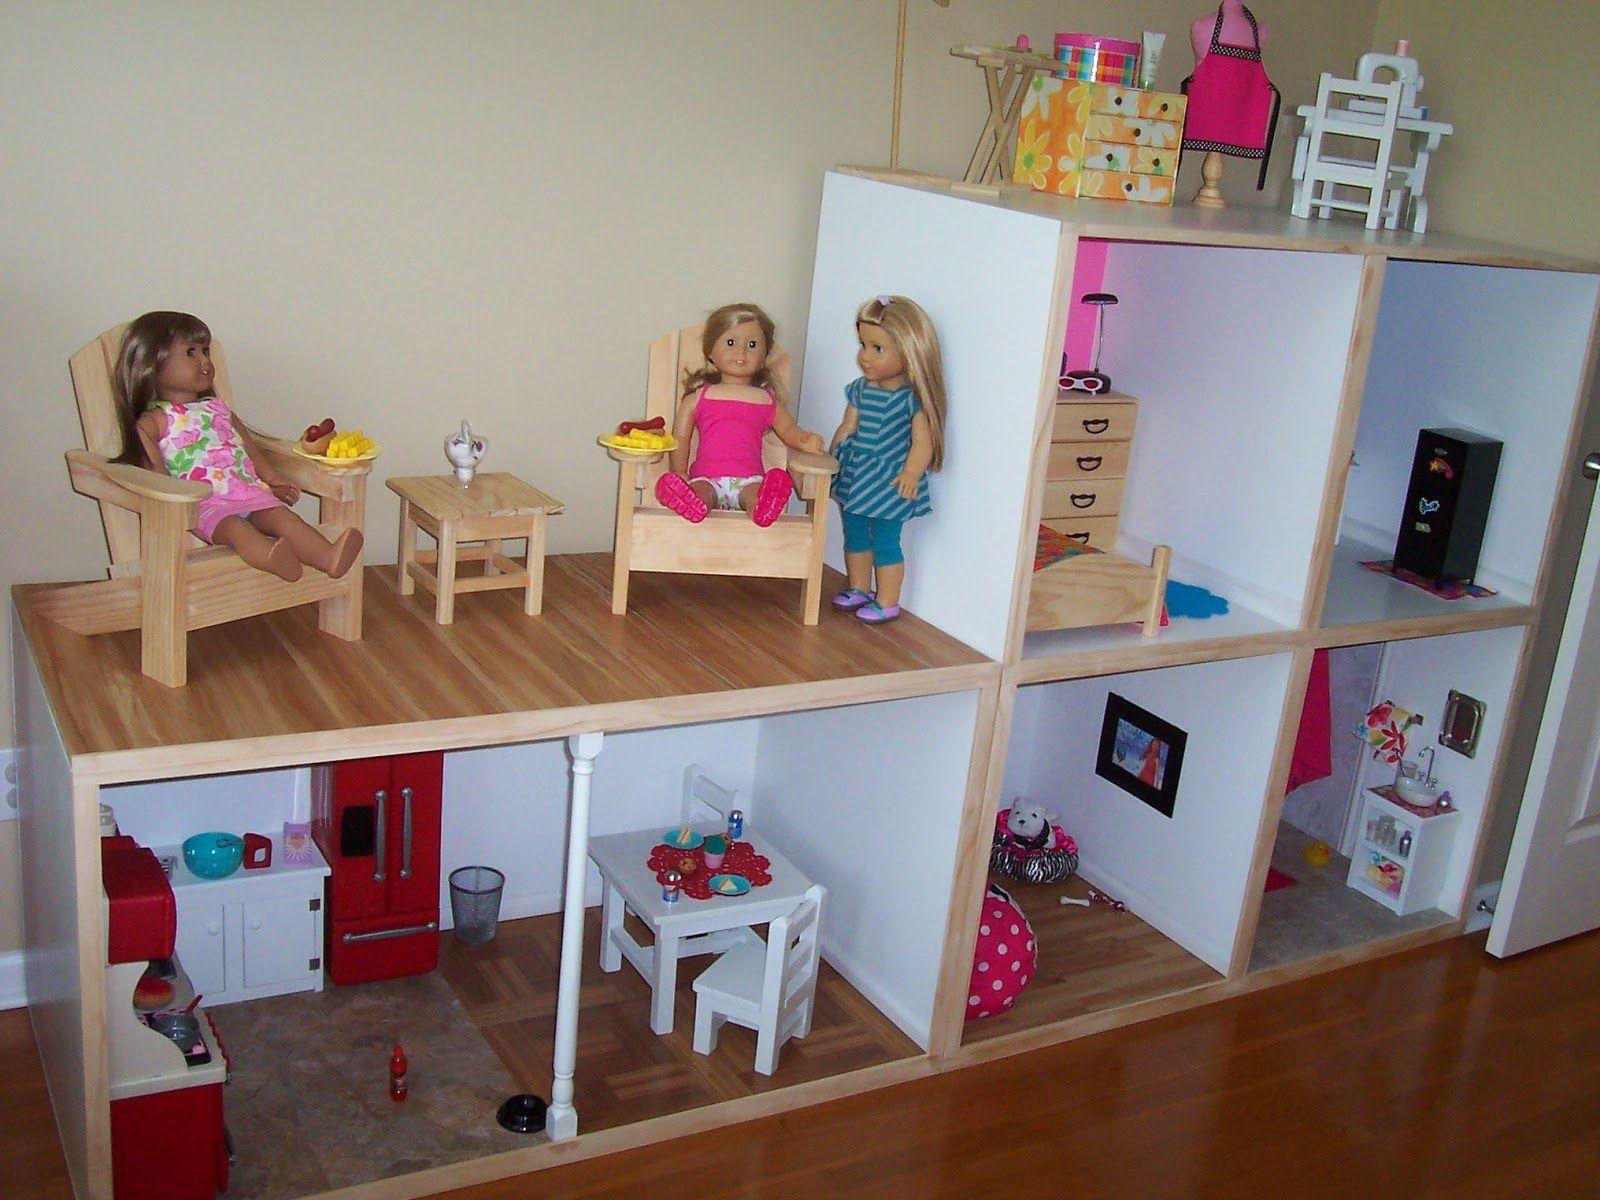 Diy american girl doll furniture - Gigi S Doll And Craft Creations American Girl Doll House Custom Built